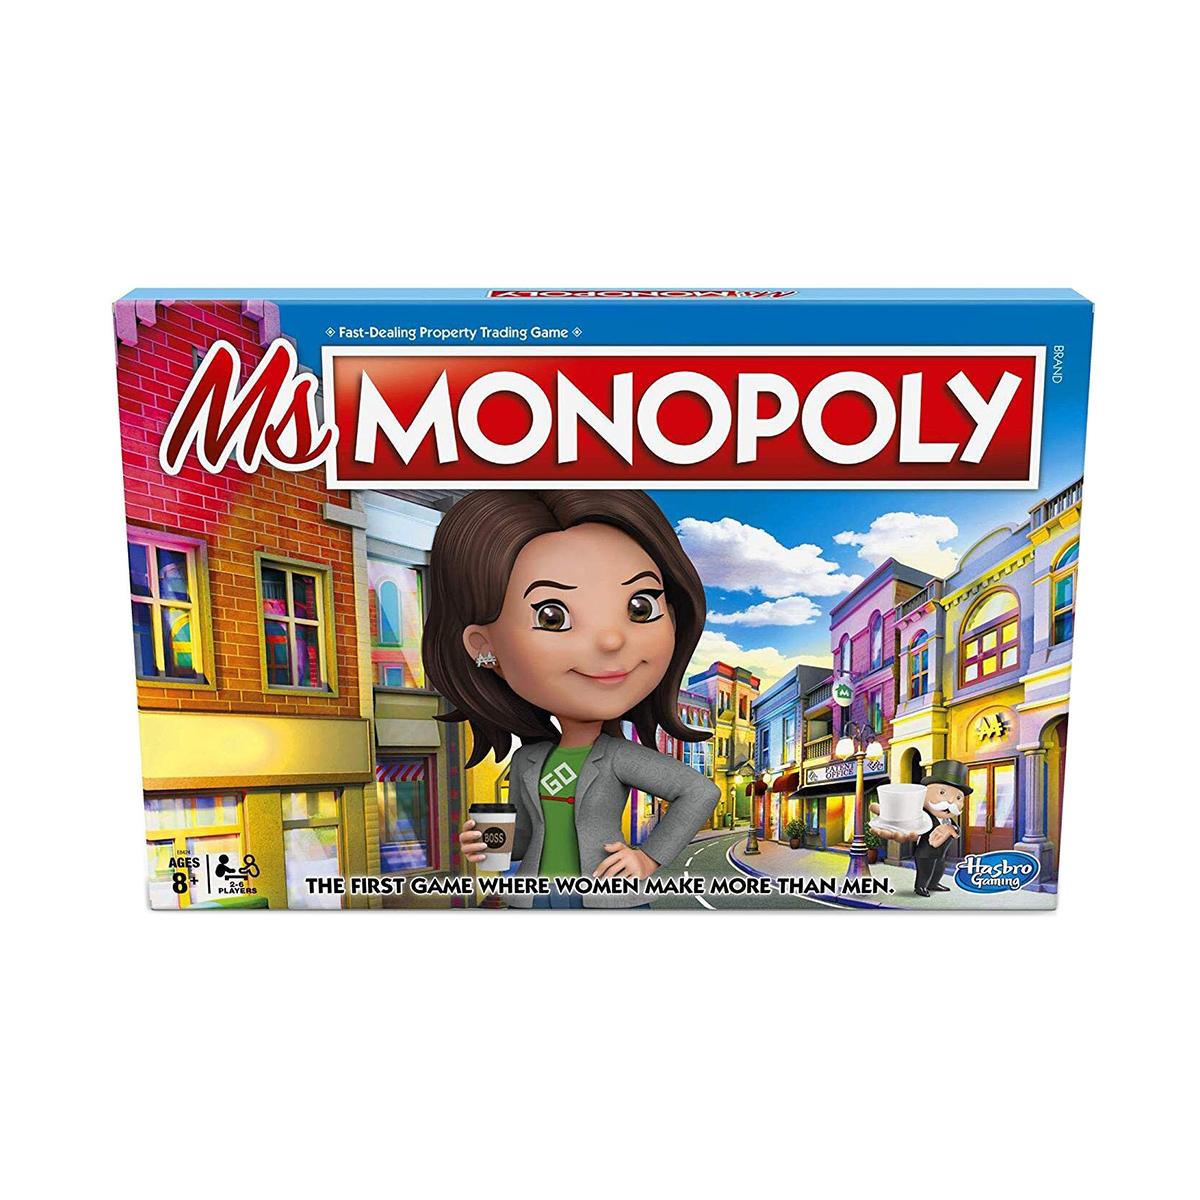 Joc de societate Monopoly, Ms. Monopoly